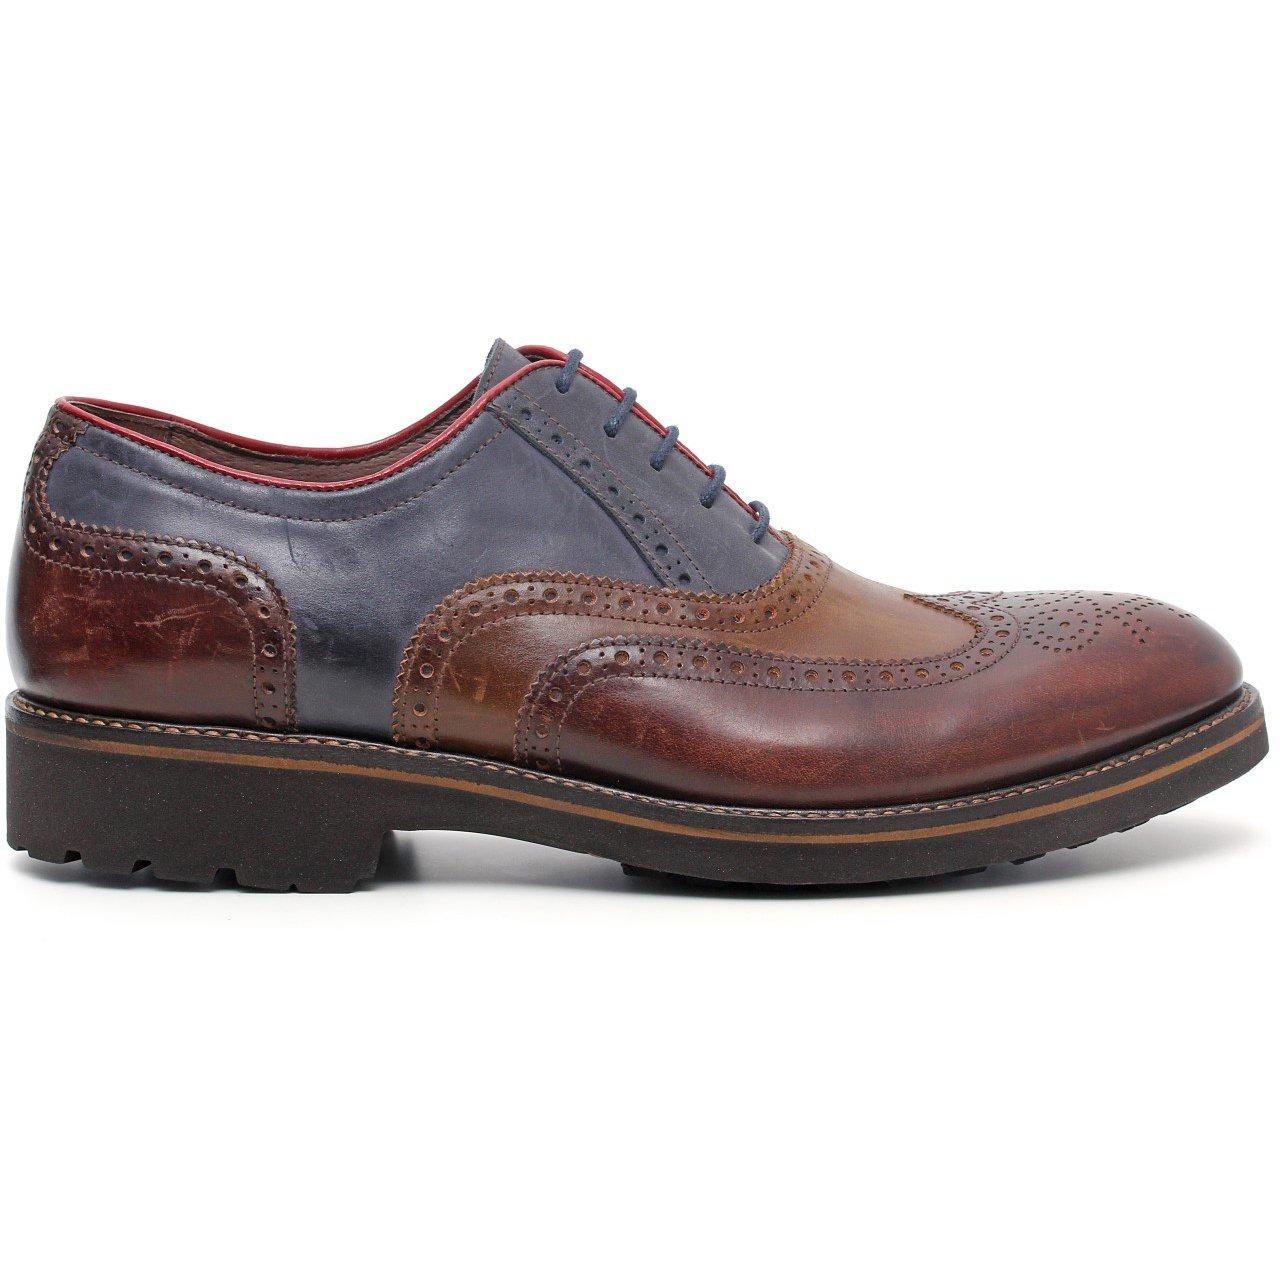 Nero giardini scarpa stringata in pelle uomo a503673u 304 latini sport - Scarpa uomo nero giardini ...